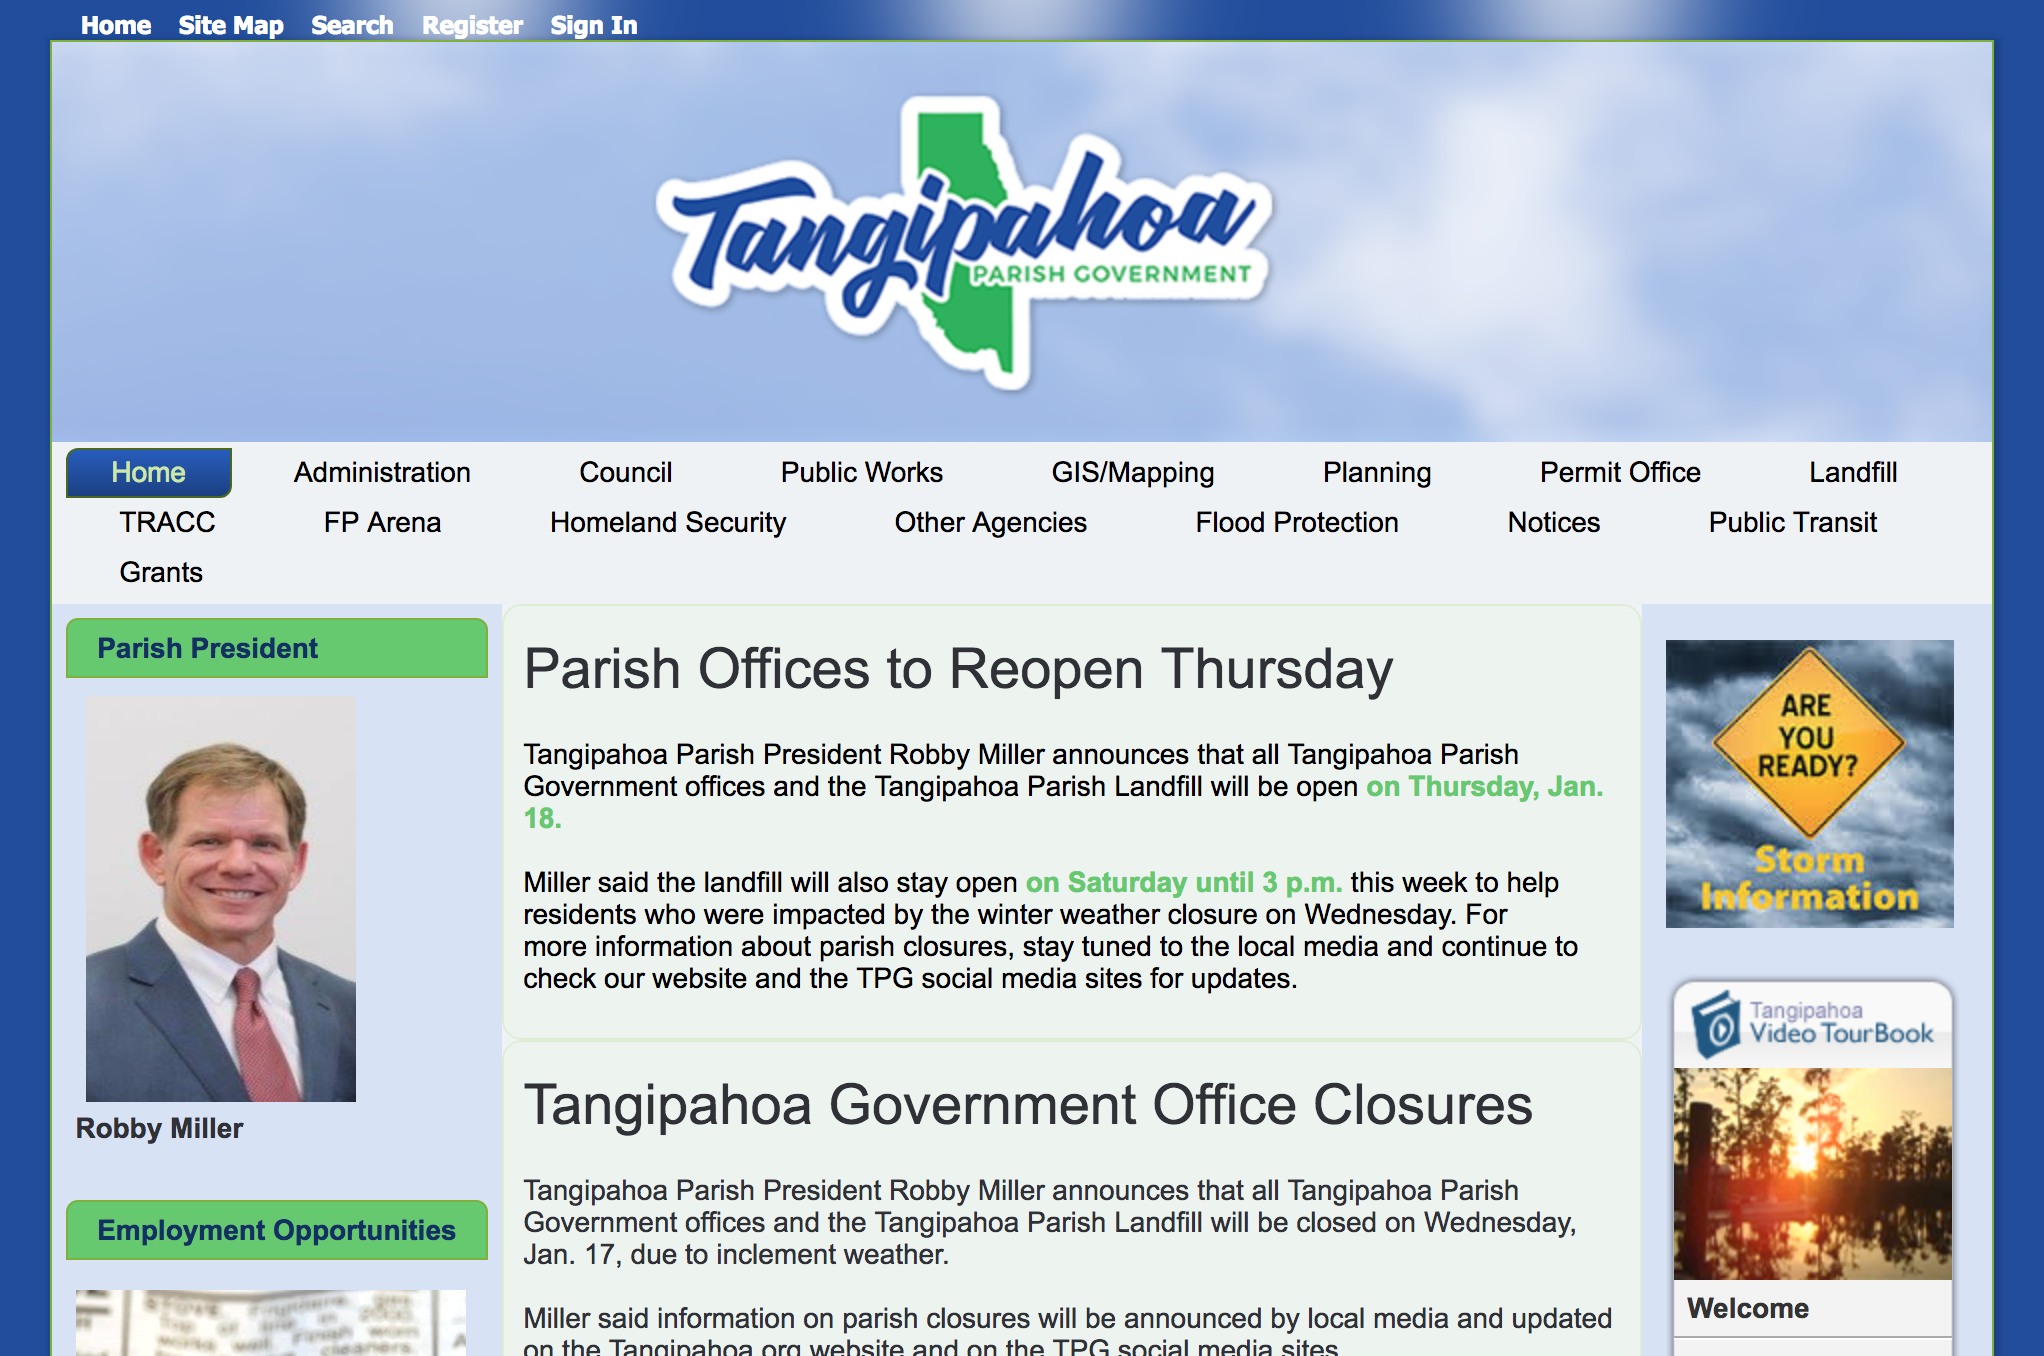 Tangipahoa Parish Government